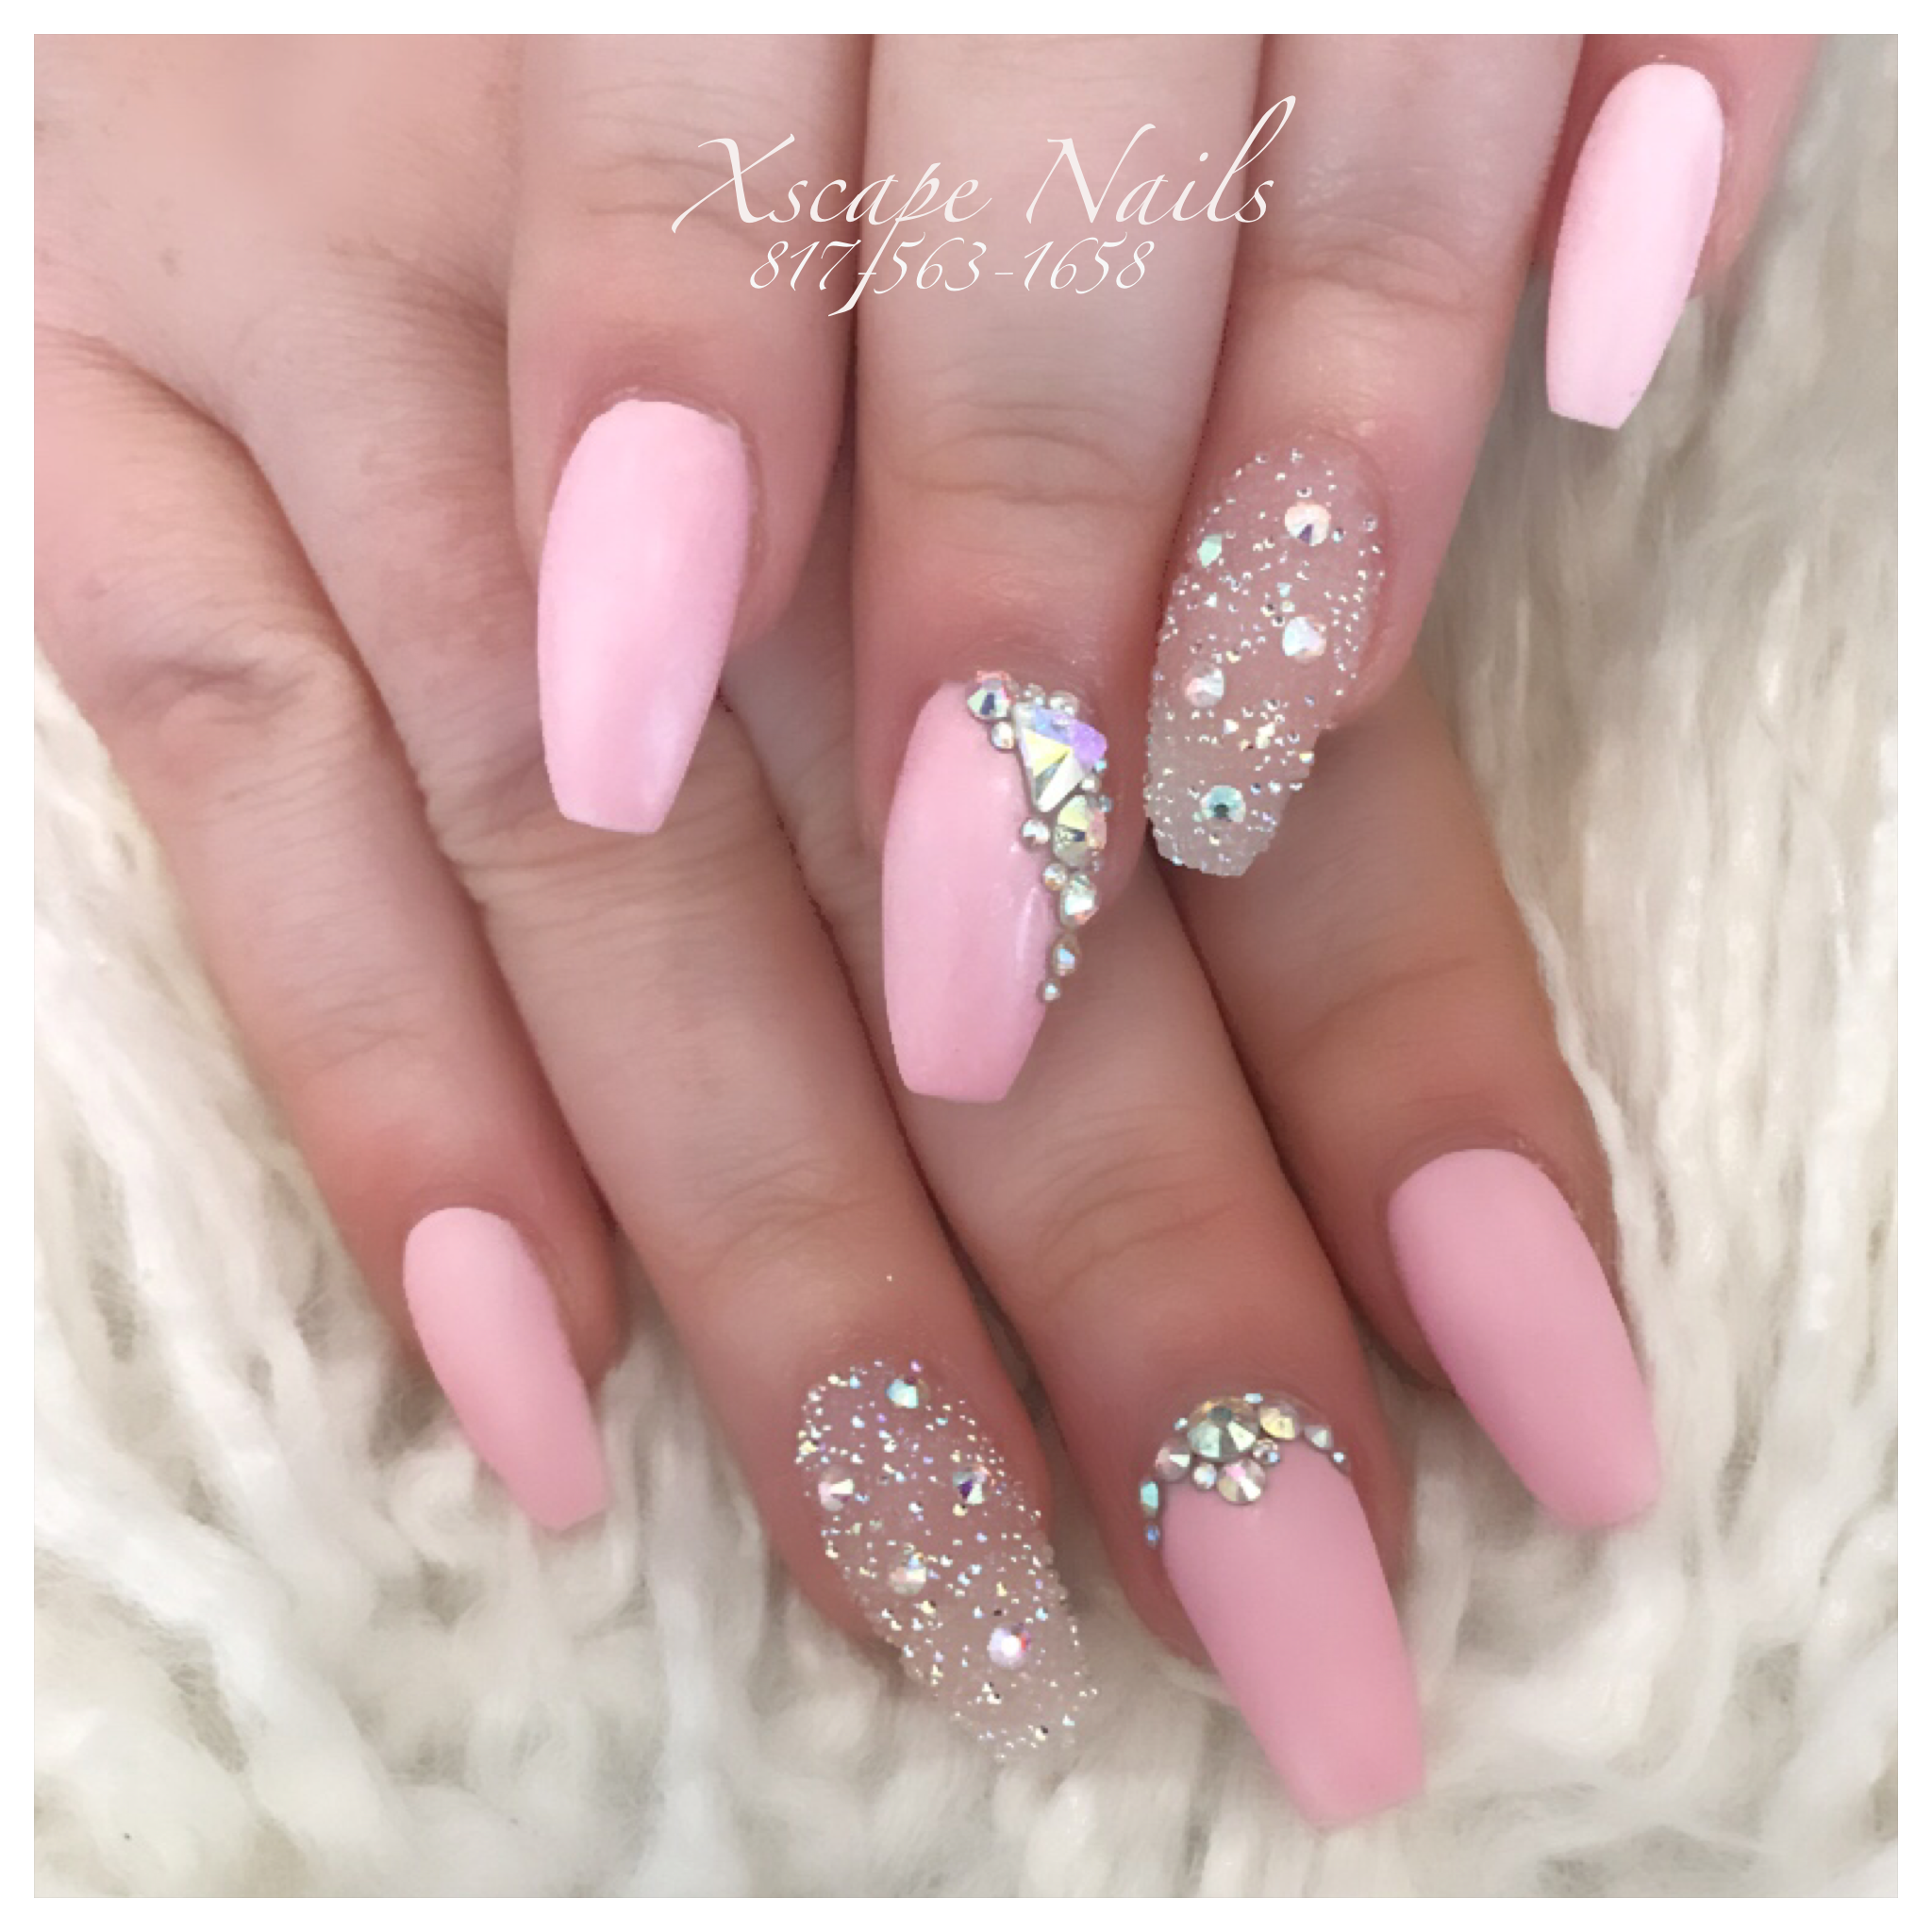 Matte crystal pixie pink nails | Cute Nails Designs | Pinterest ...